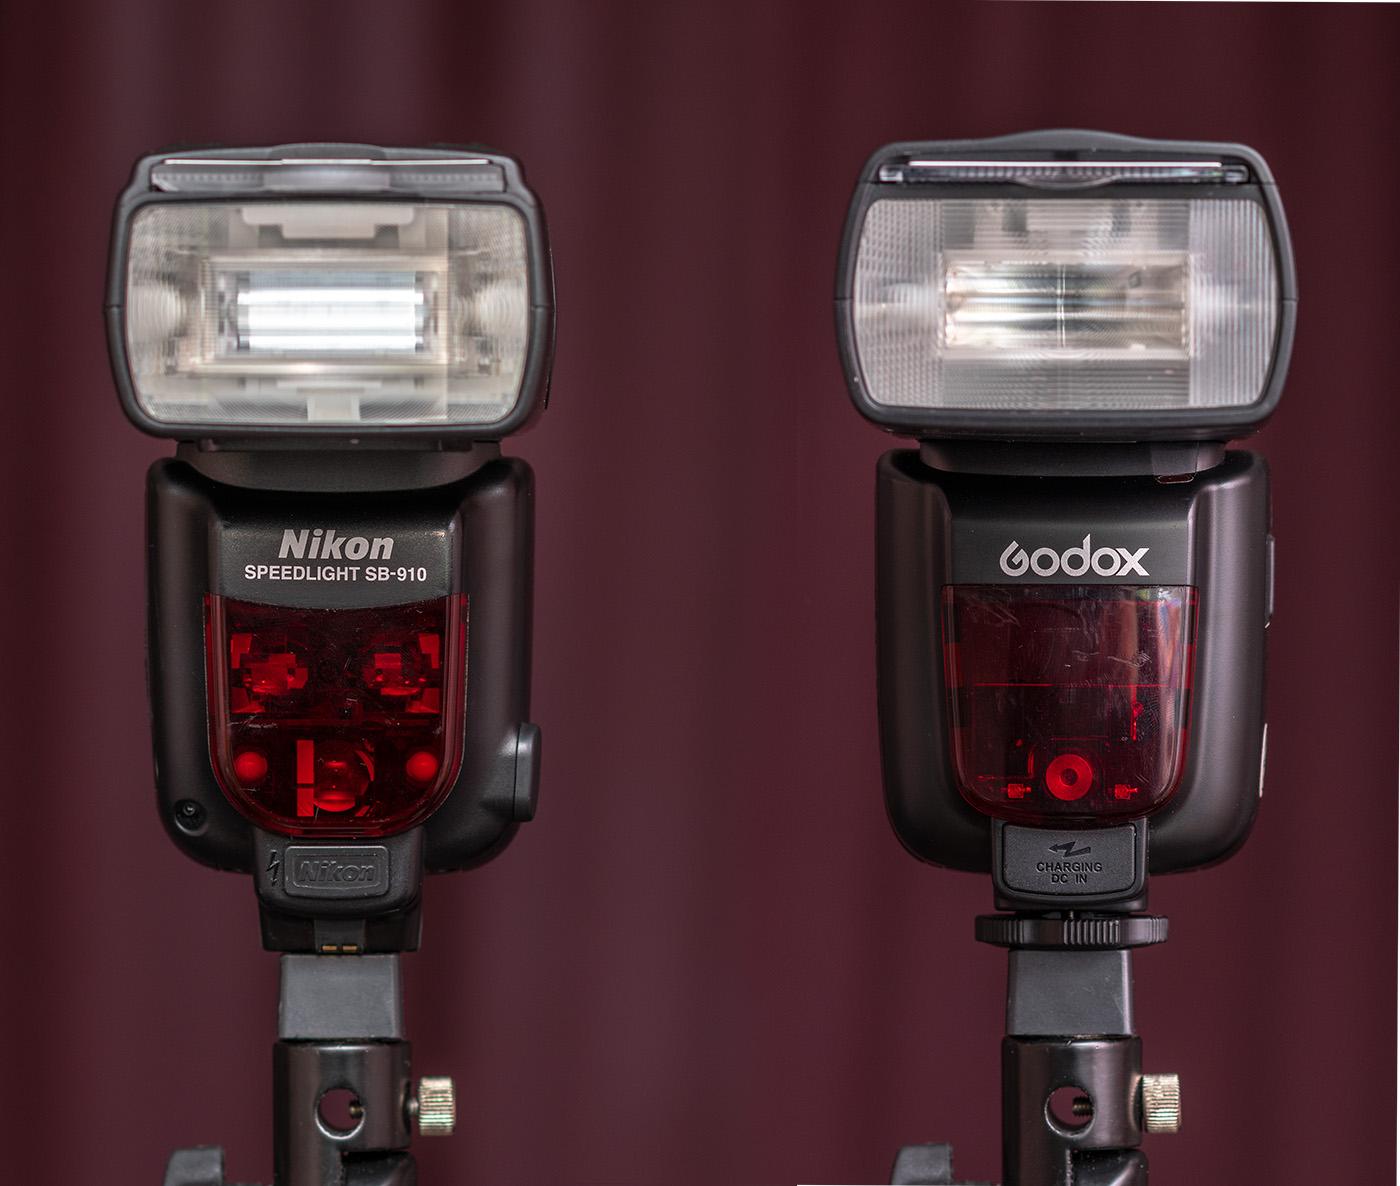 Фото 1. Сравнение внешнего вида вспышек Nikon SB-910 и Godox TT685n. Вид спереди. Отзыв владельца.